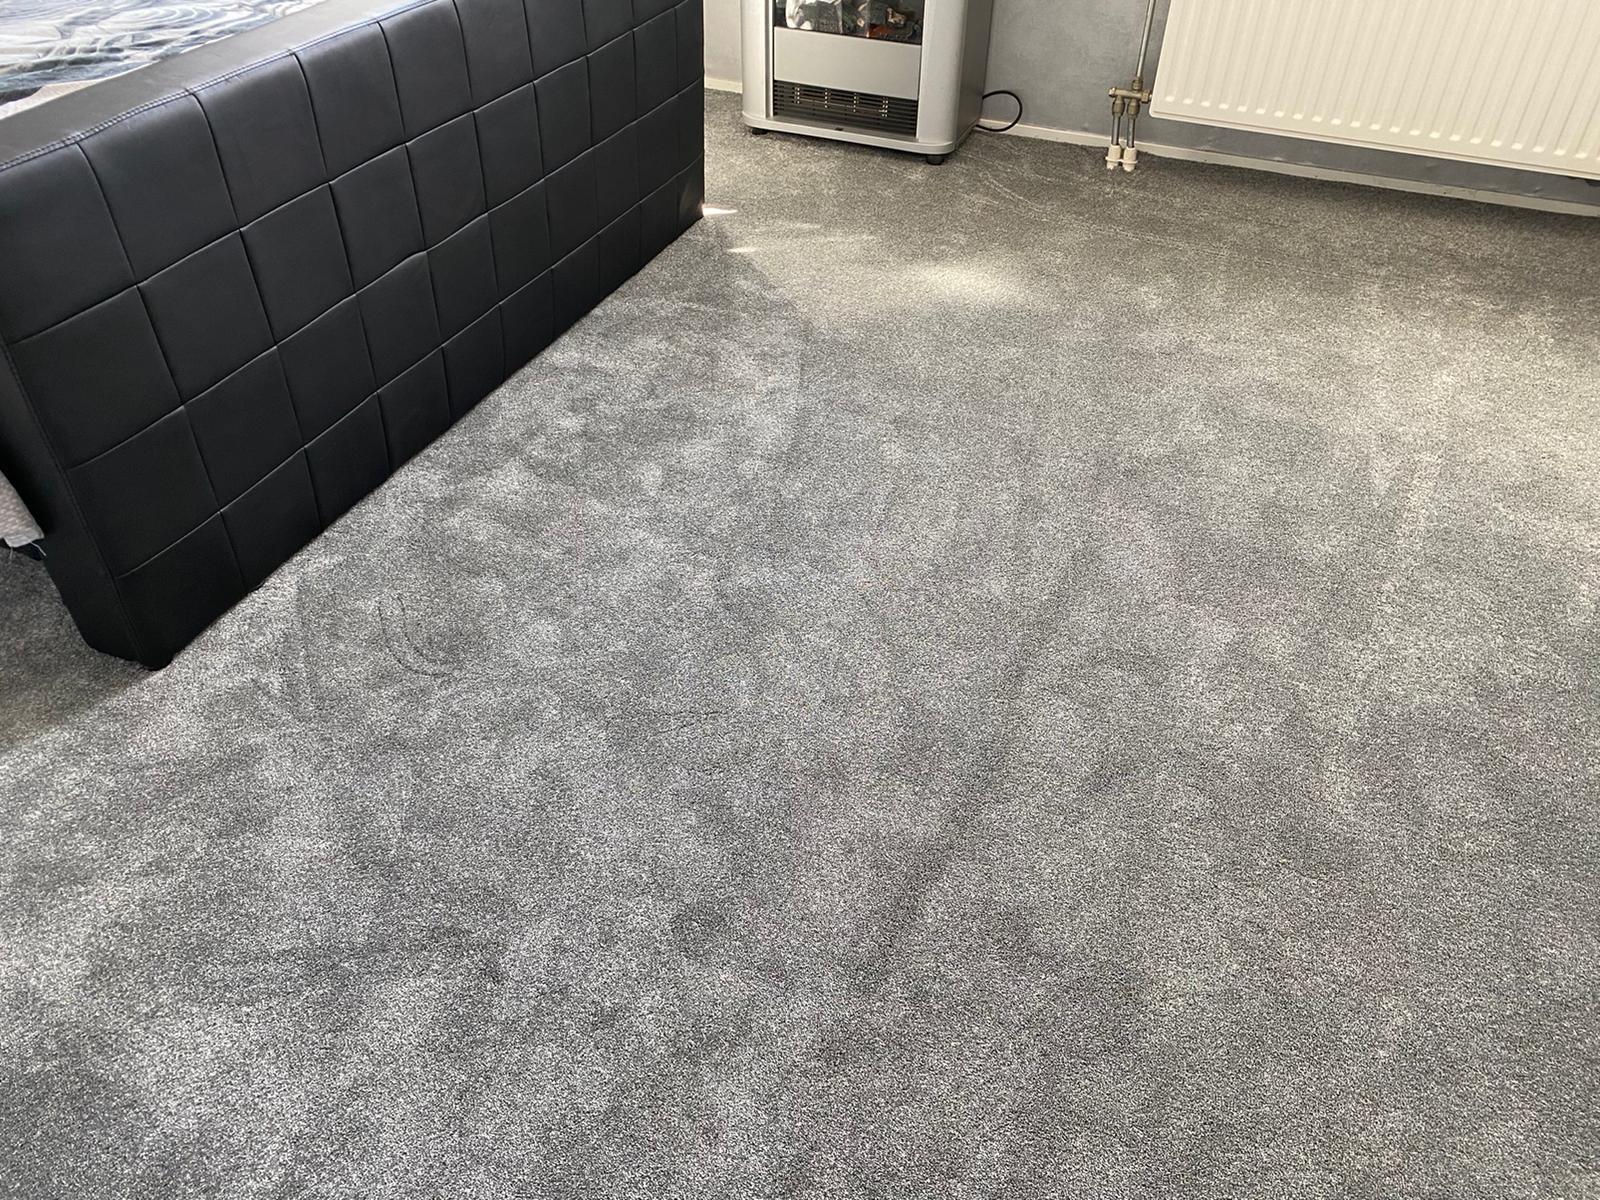 Bacovloeren tapijt leggen woonkamer